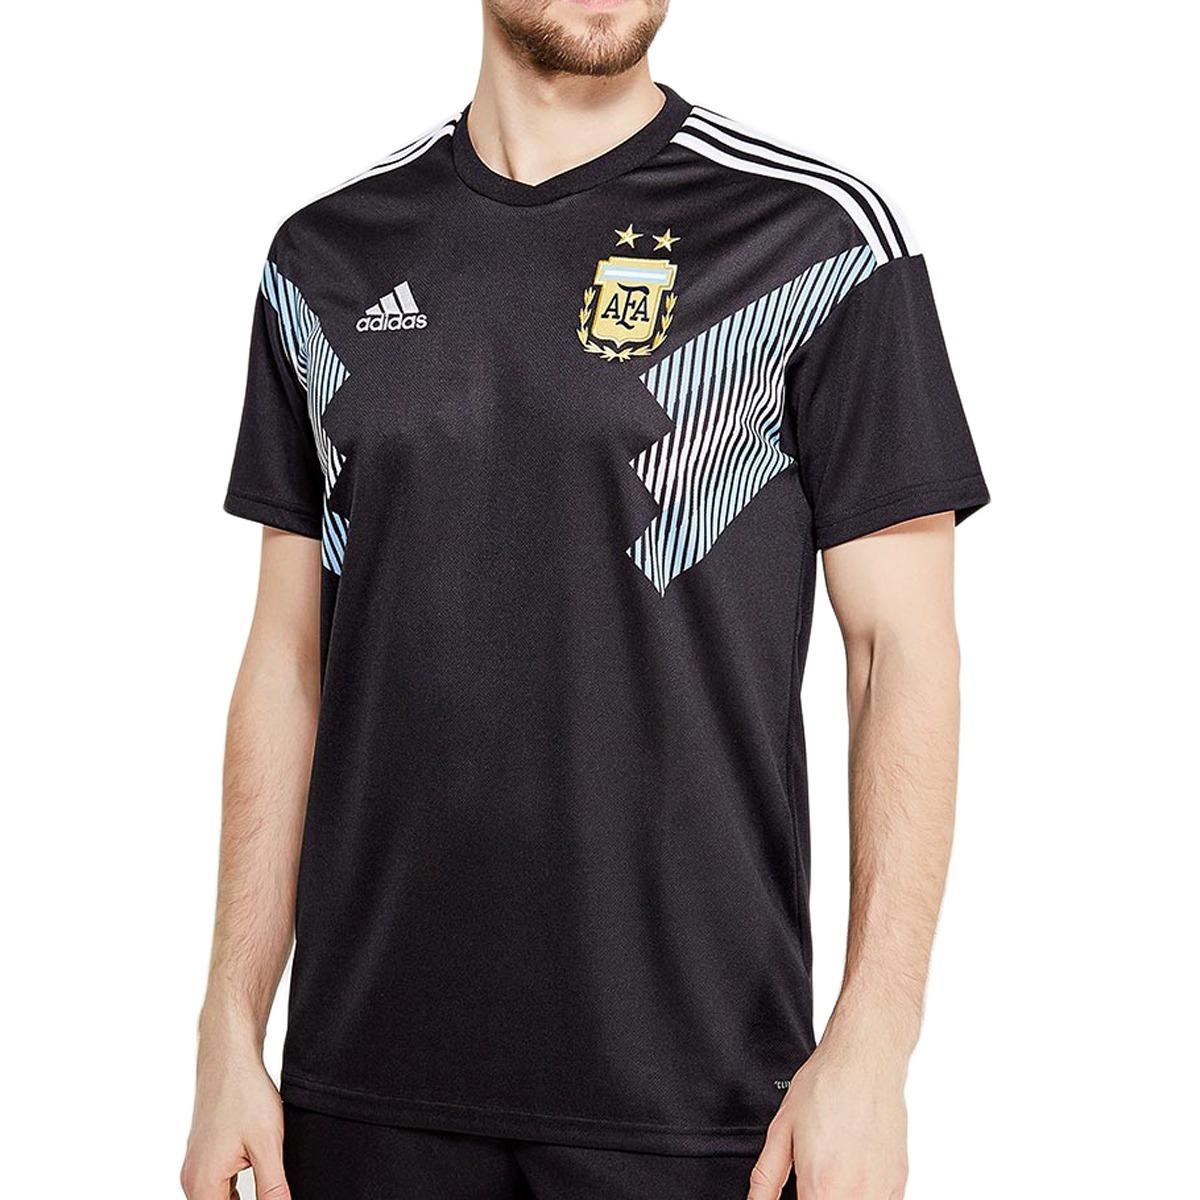 camiseta de futbol adidas futbol afa away hombre ng ce. Cargando zoom. 85685f6974d83